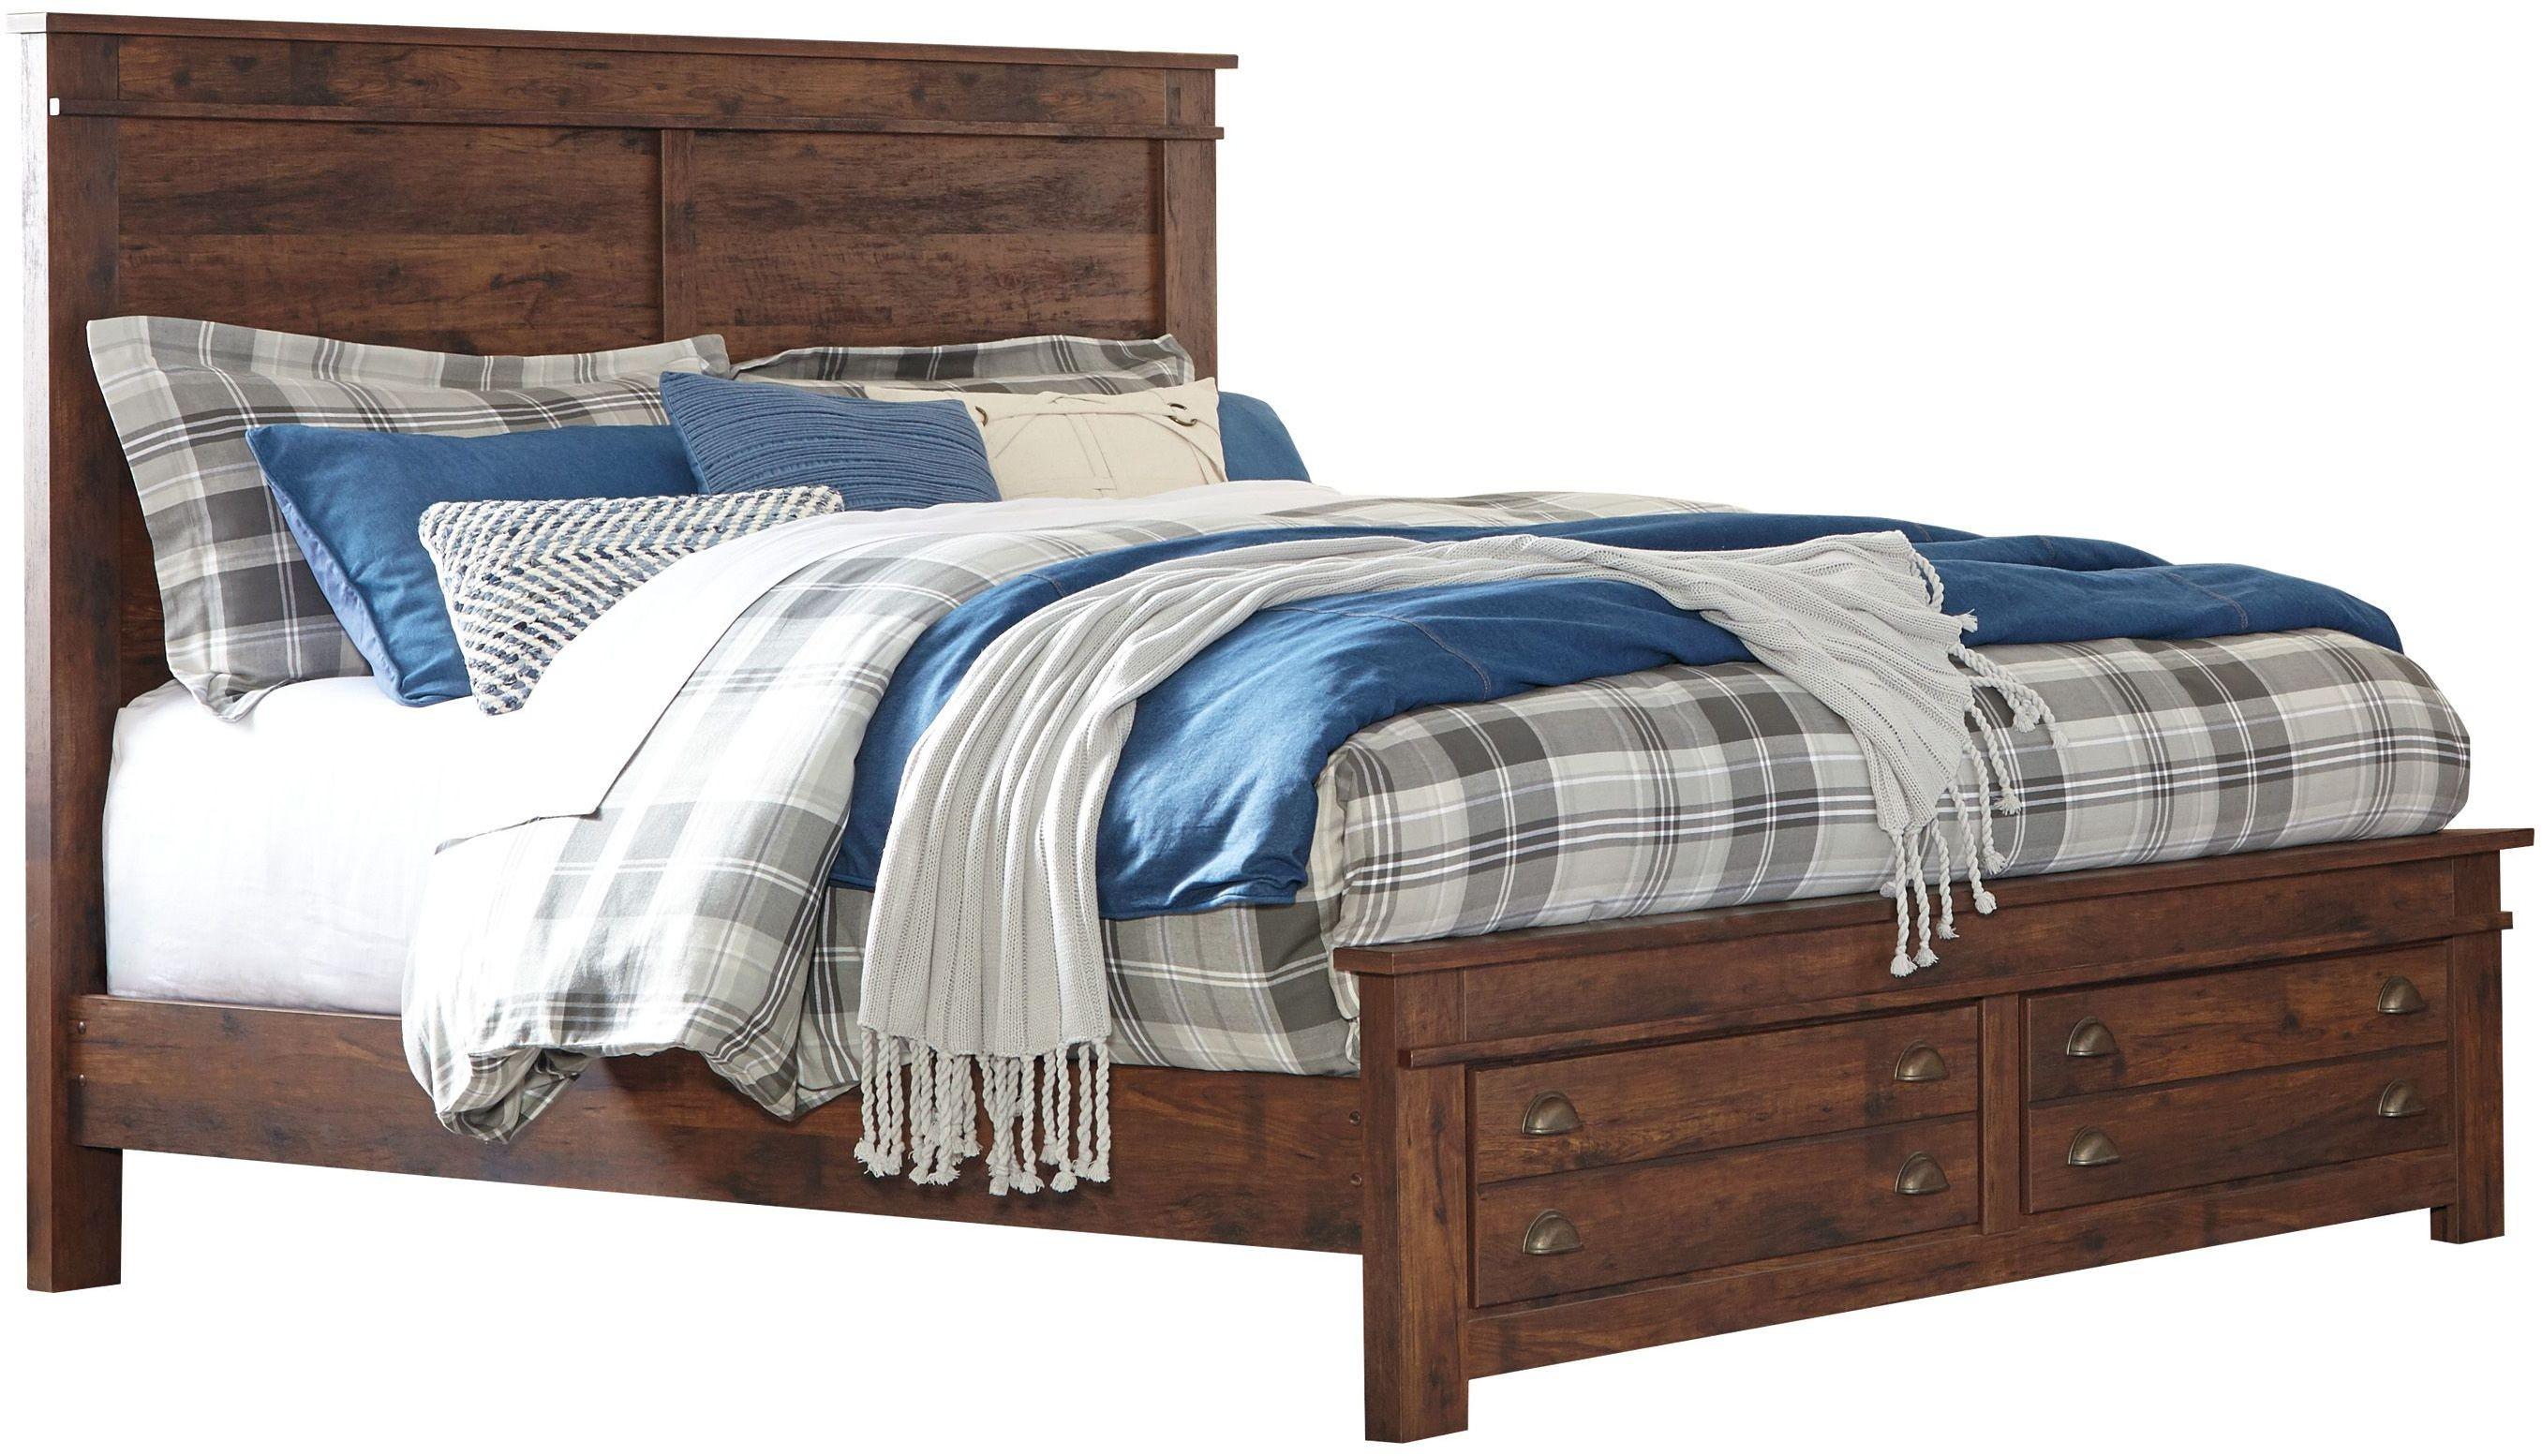 hammerstead brown queen platform storage bed b407 54s 57 95 b100 13 ashley. Black Bedroom Furniture Sets. Home Design Ideas